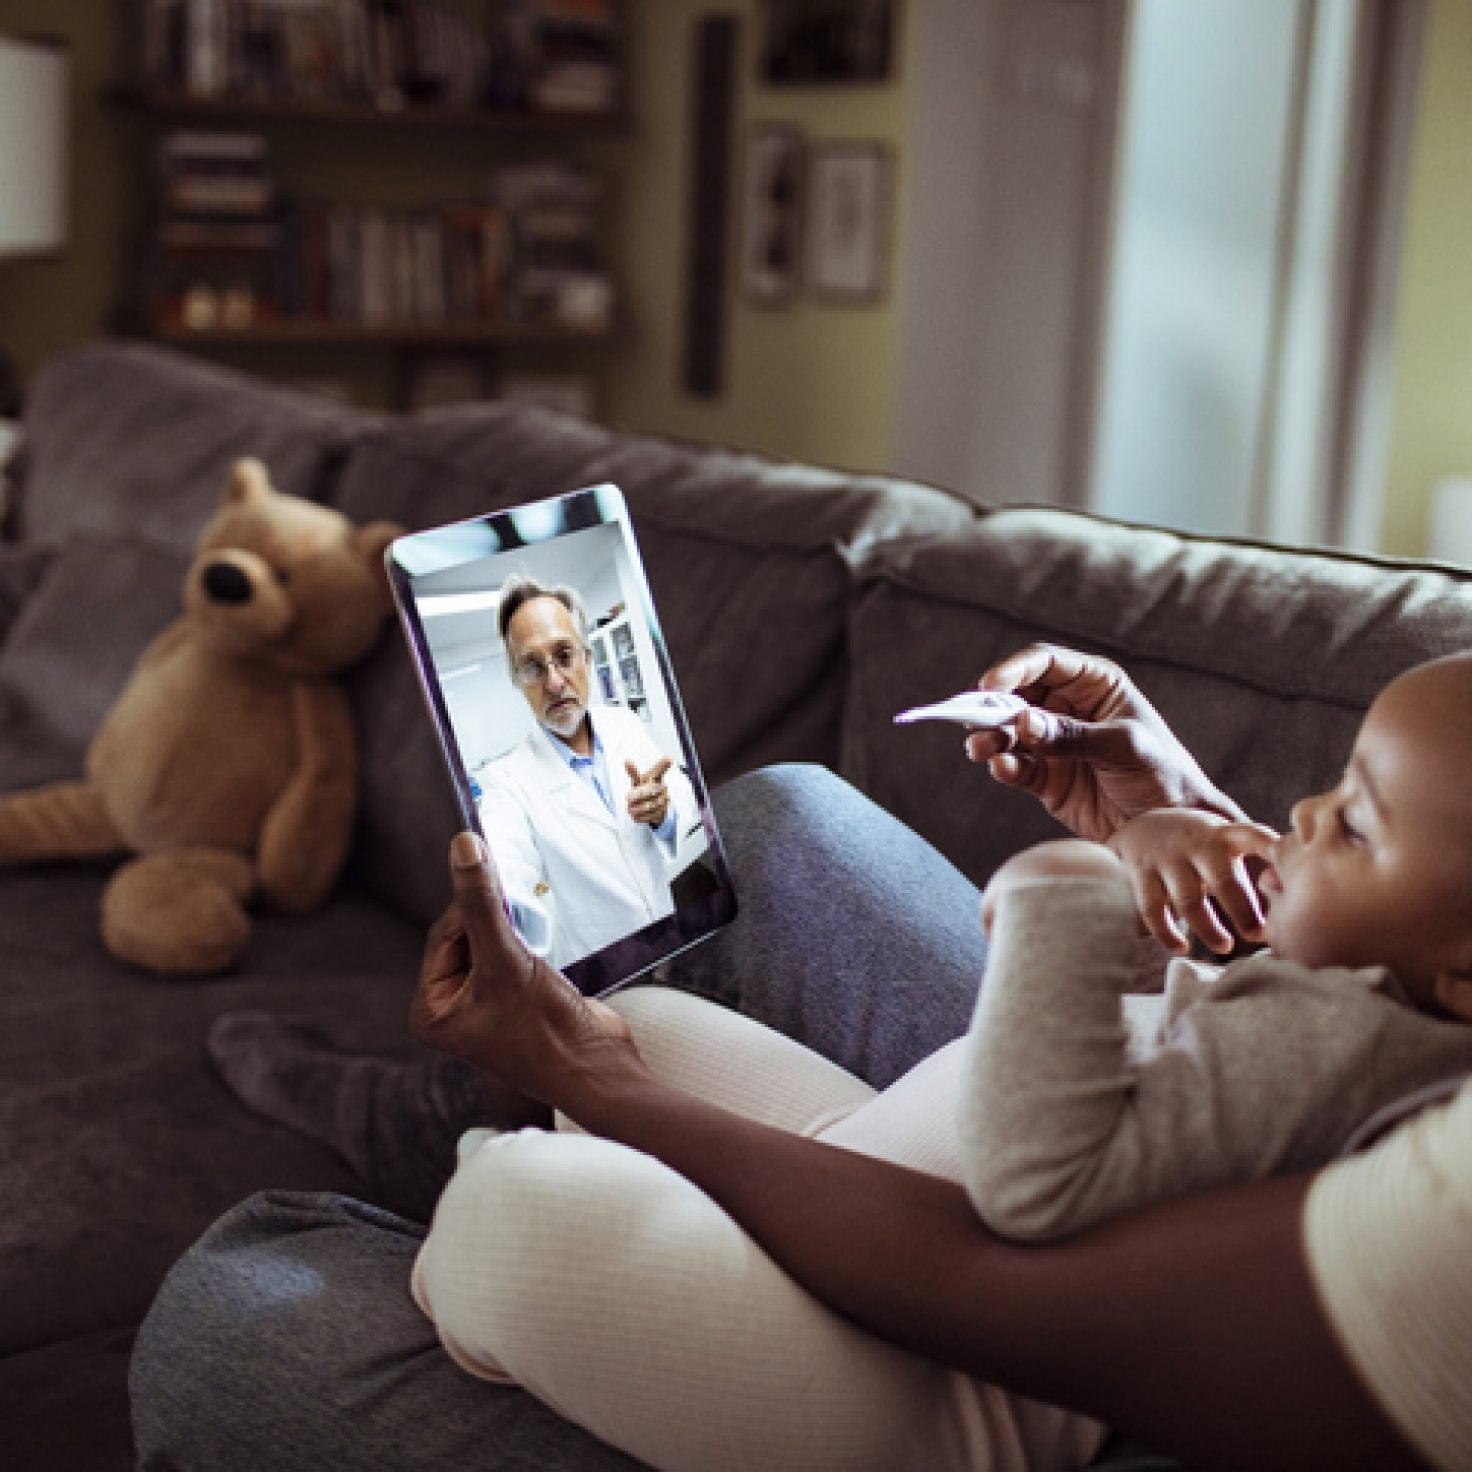 Birthing While Black: Navigating Medical Racism During COVID-19